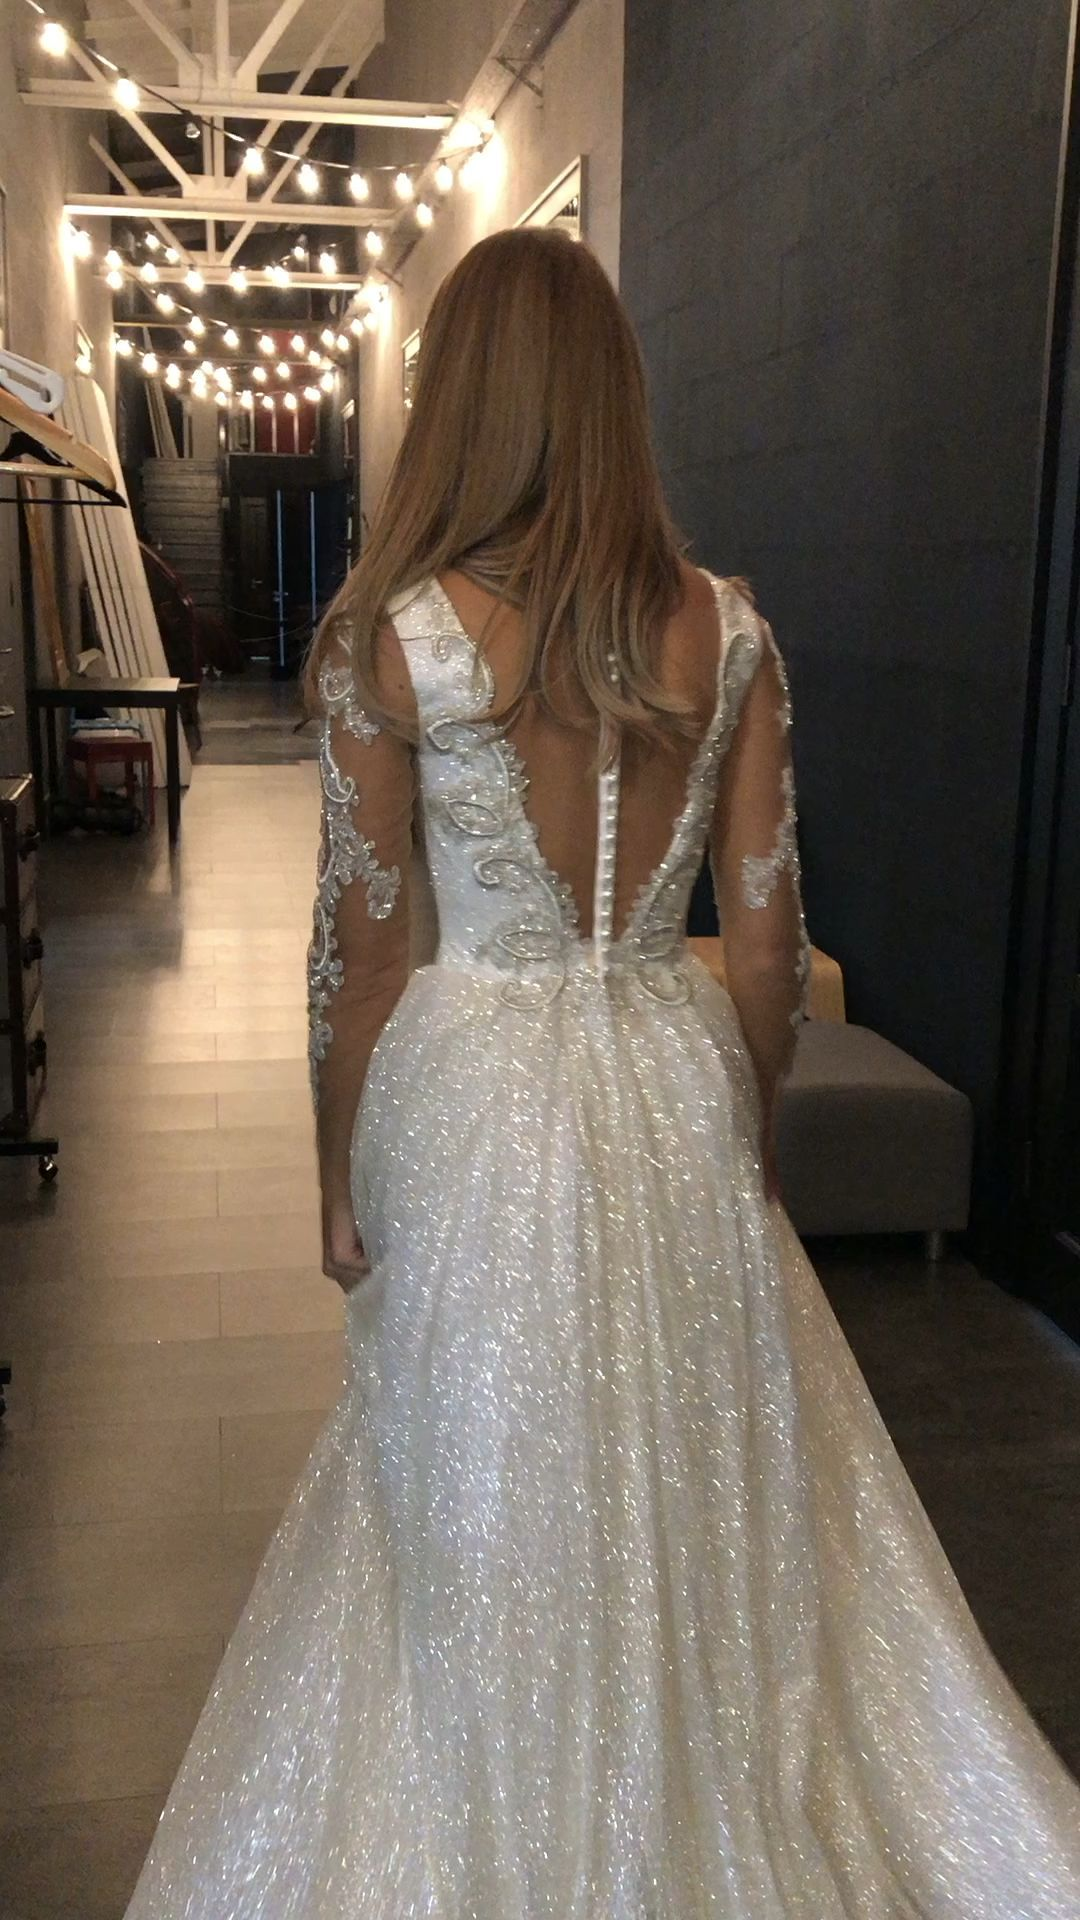 "wedding dress ""Udjin"" by Olivia Bottega. Ball wedding dress. With sparkly glitter. Open back. Glitter skirt."